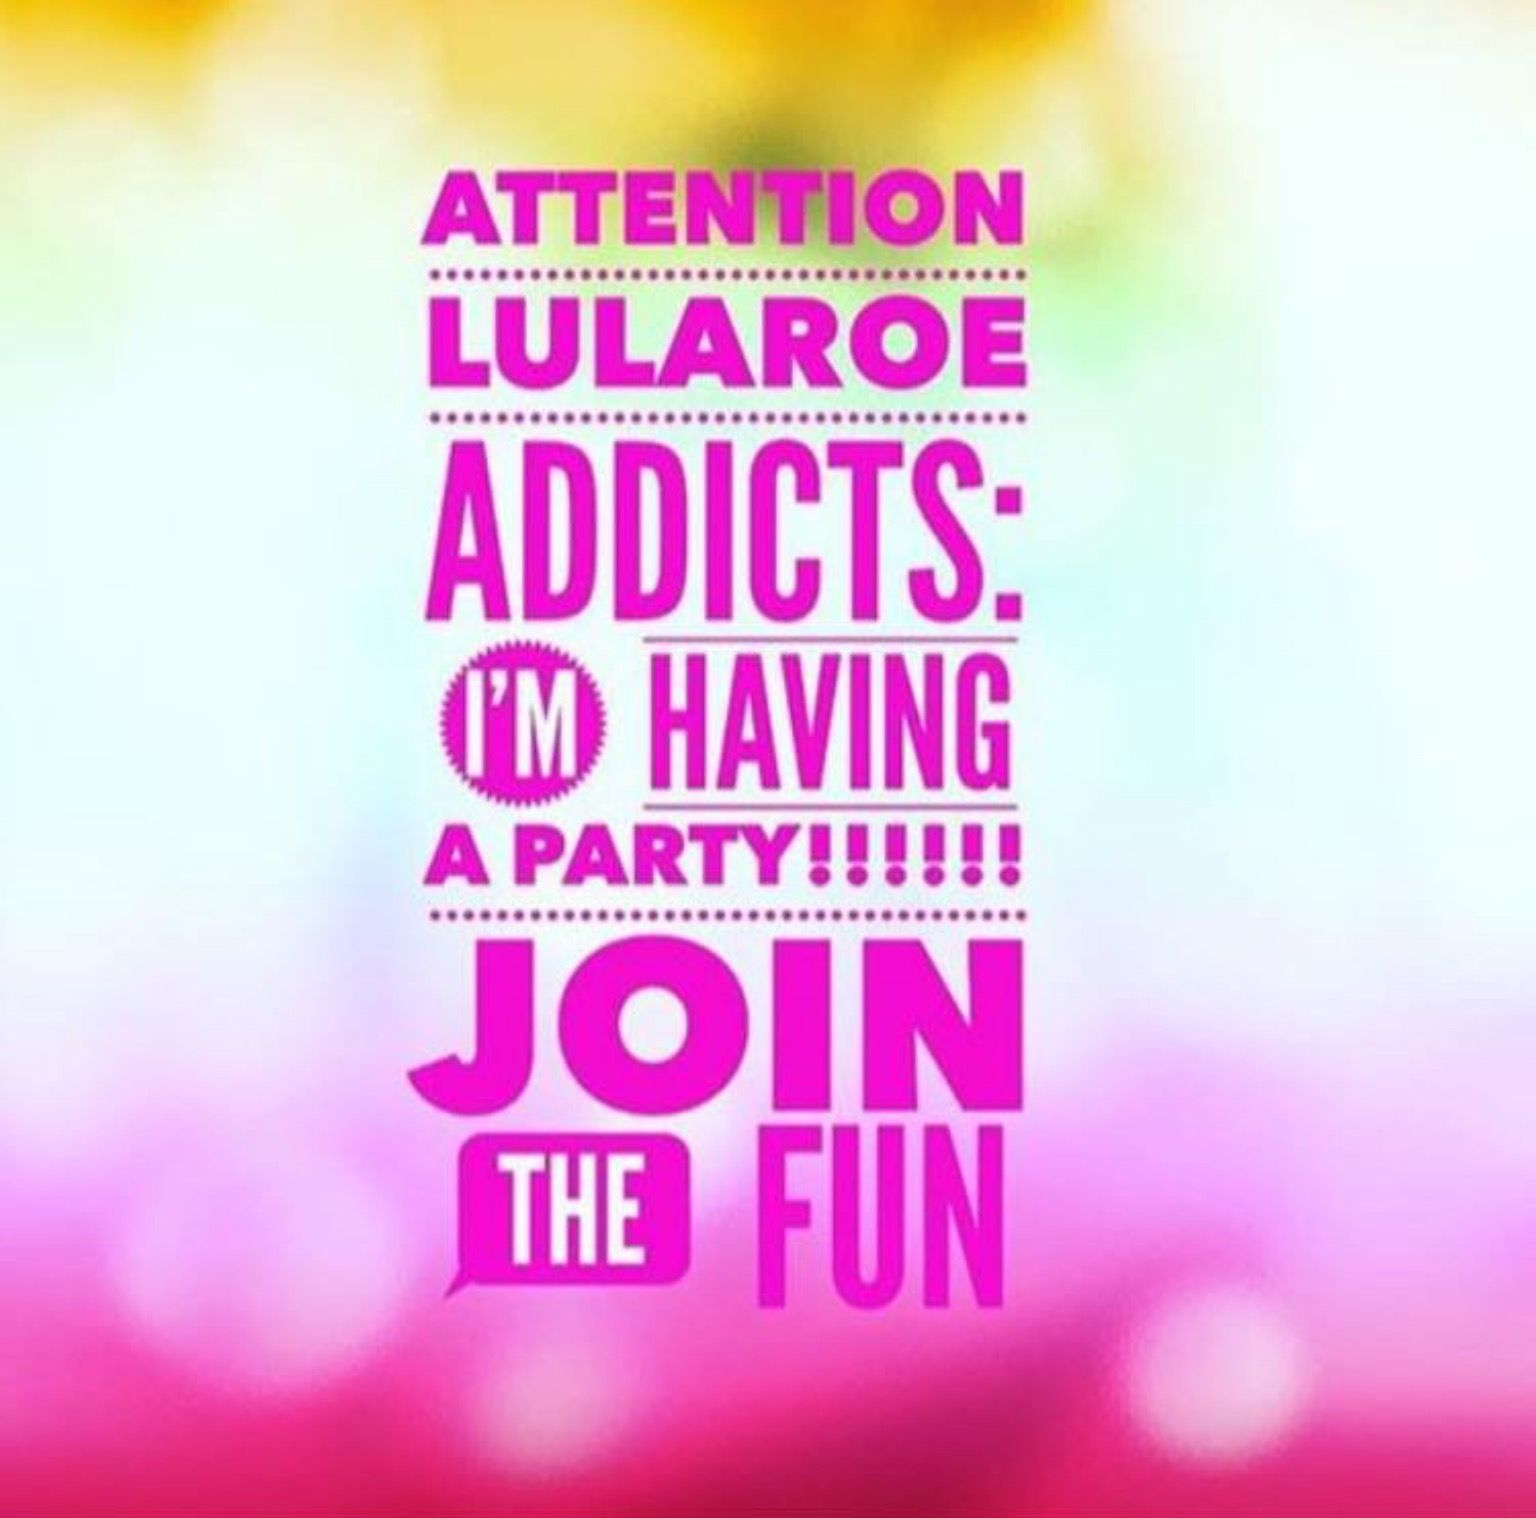 I love Lularoe